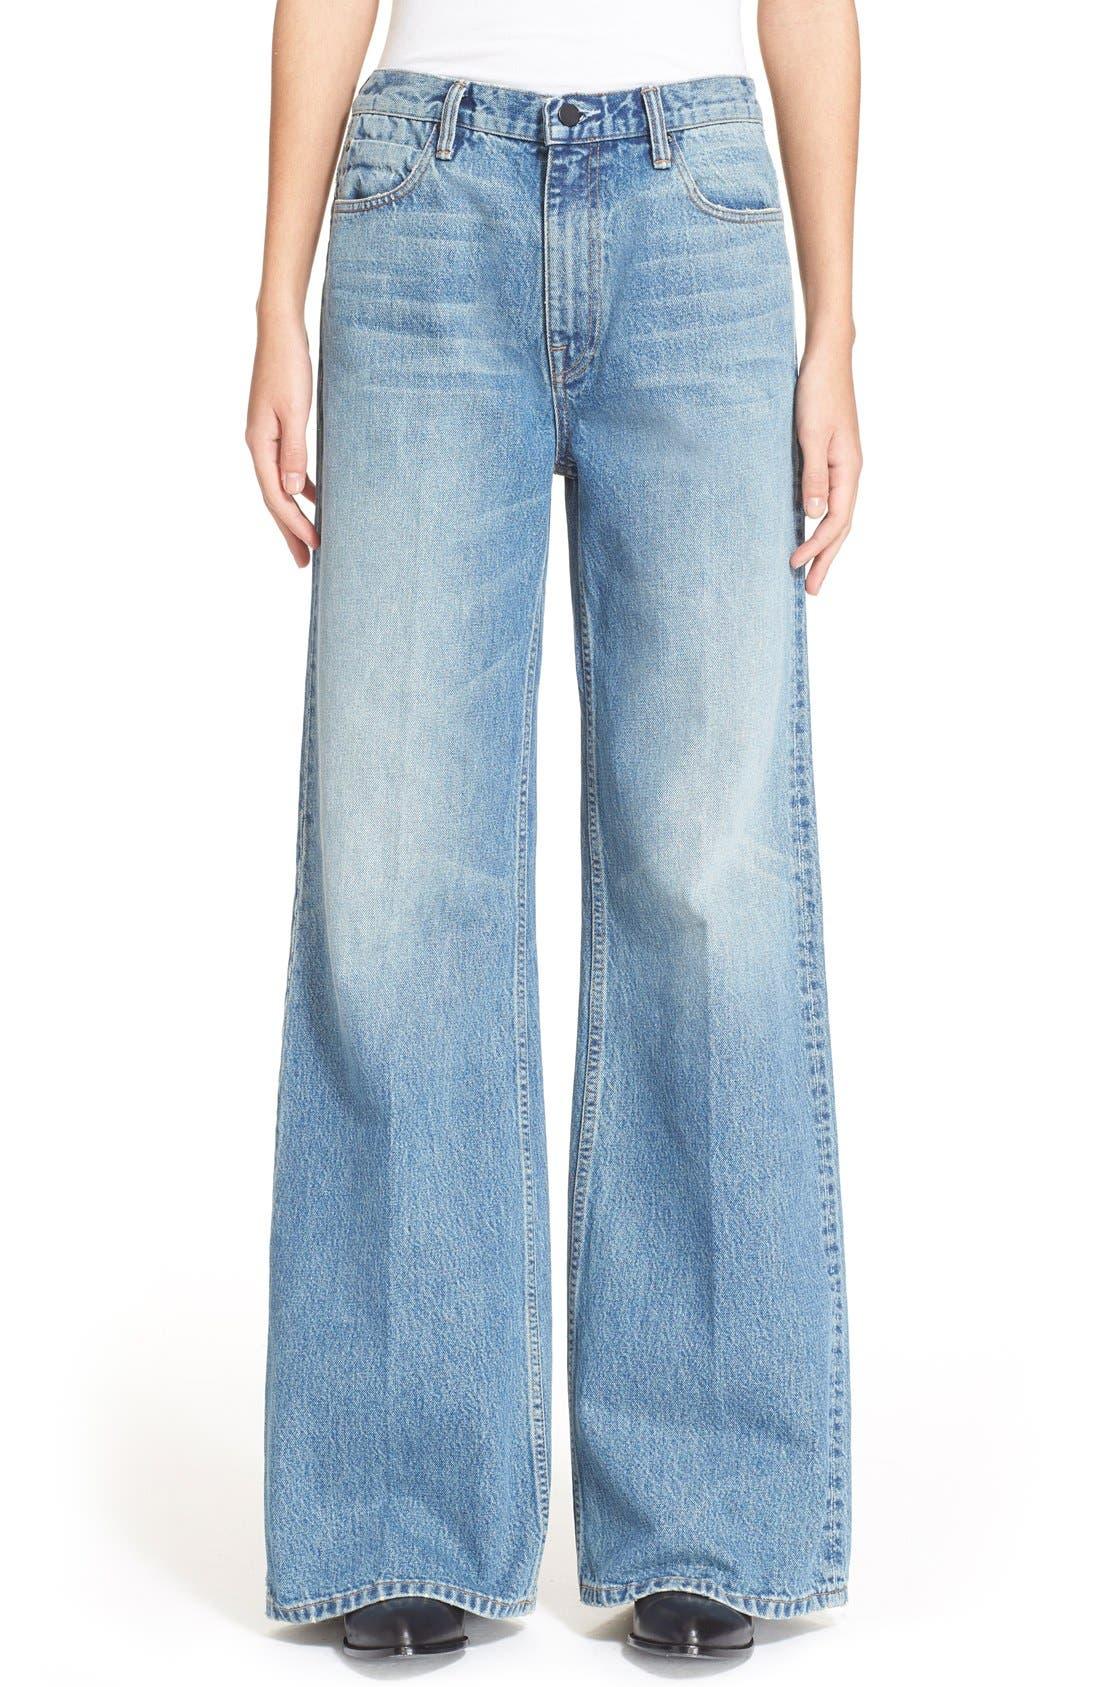 Denim x Alexander Wang Rave Wide Leg Jeans,                         Main,                         color, Light Indigo Aged